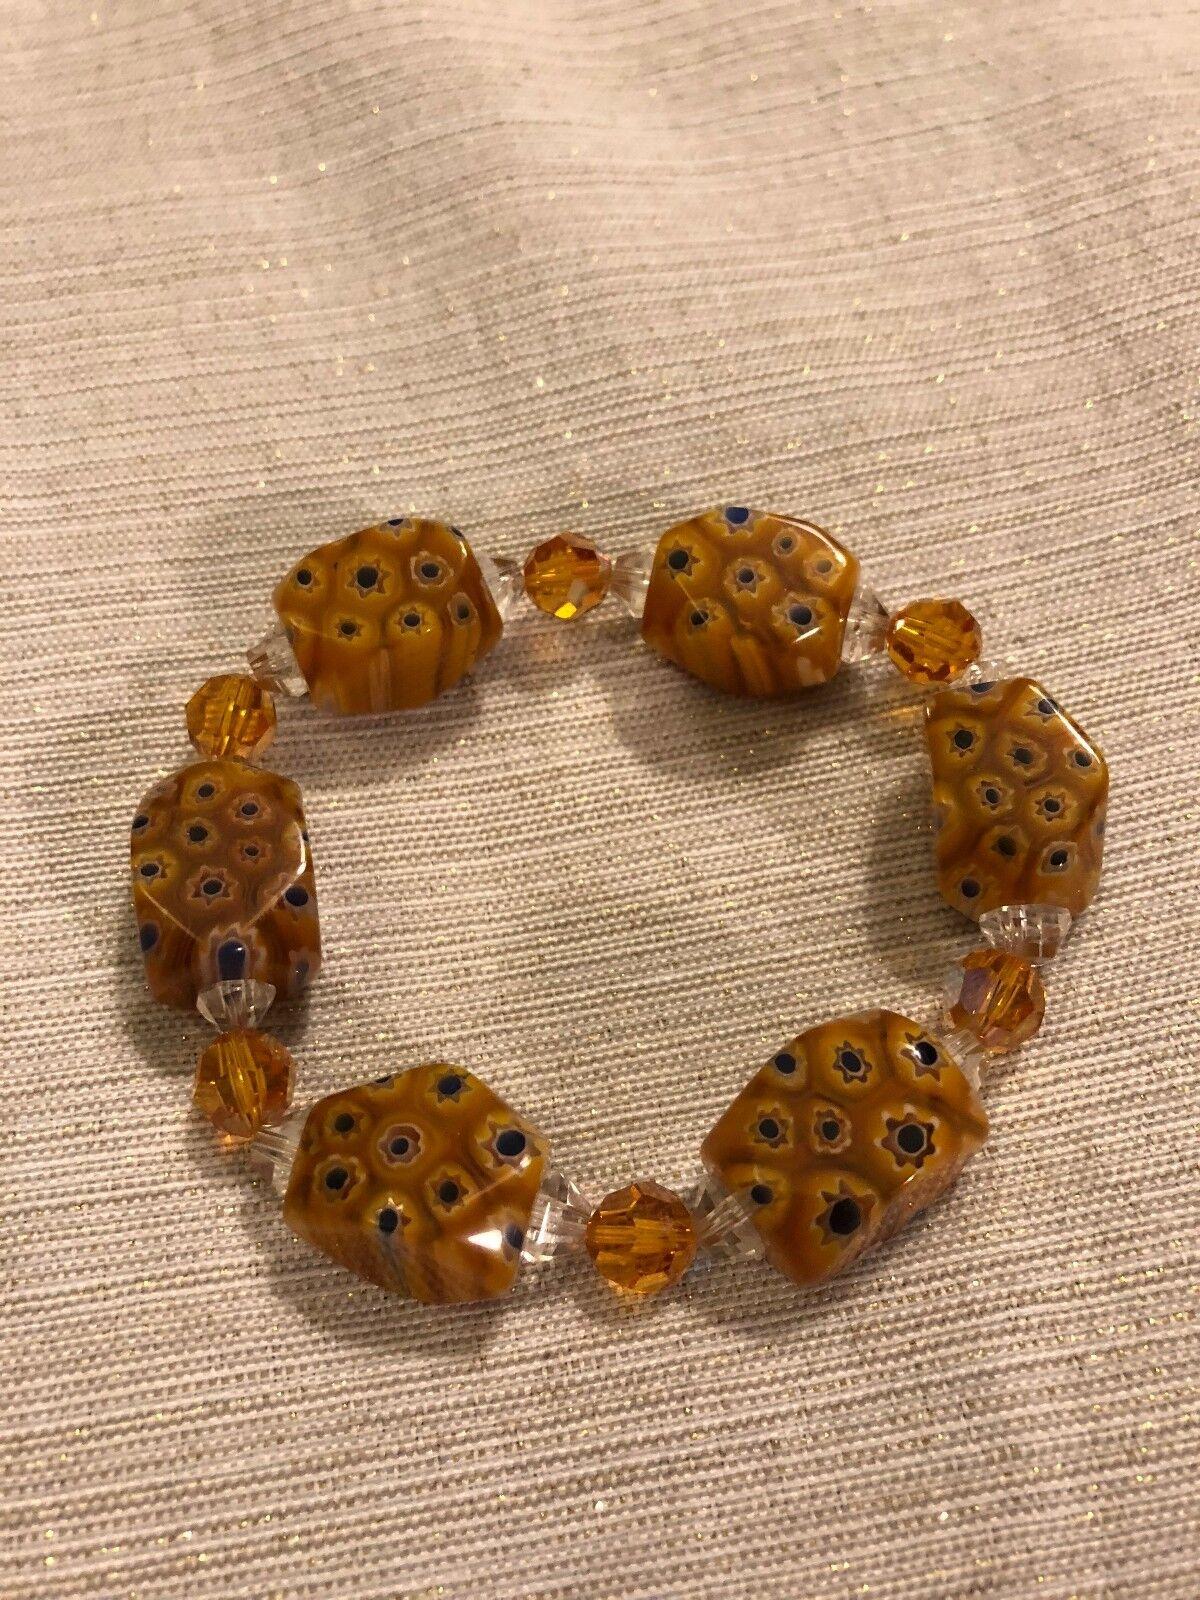 Vintage Millefiori Murano Handmade Glass Mosaic Bead Bracelet Yellows